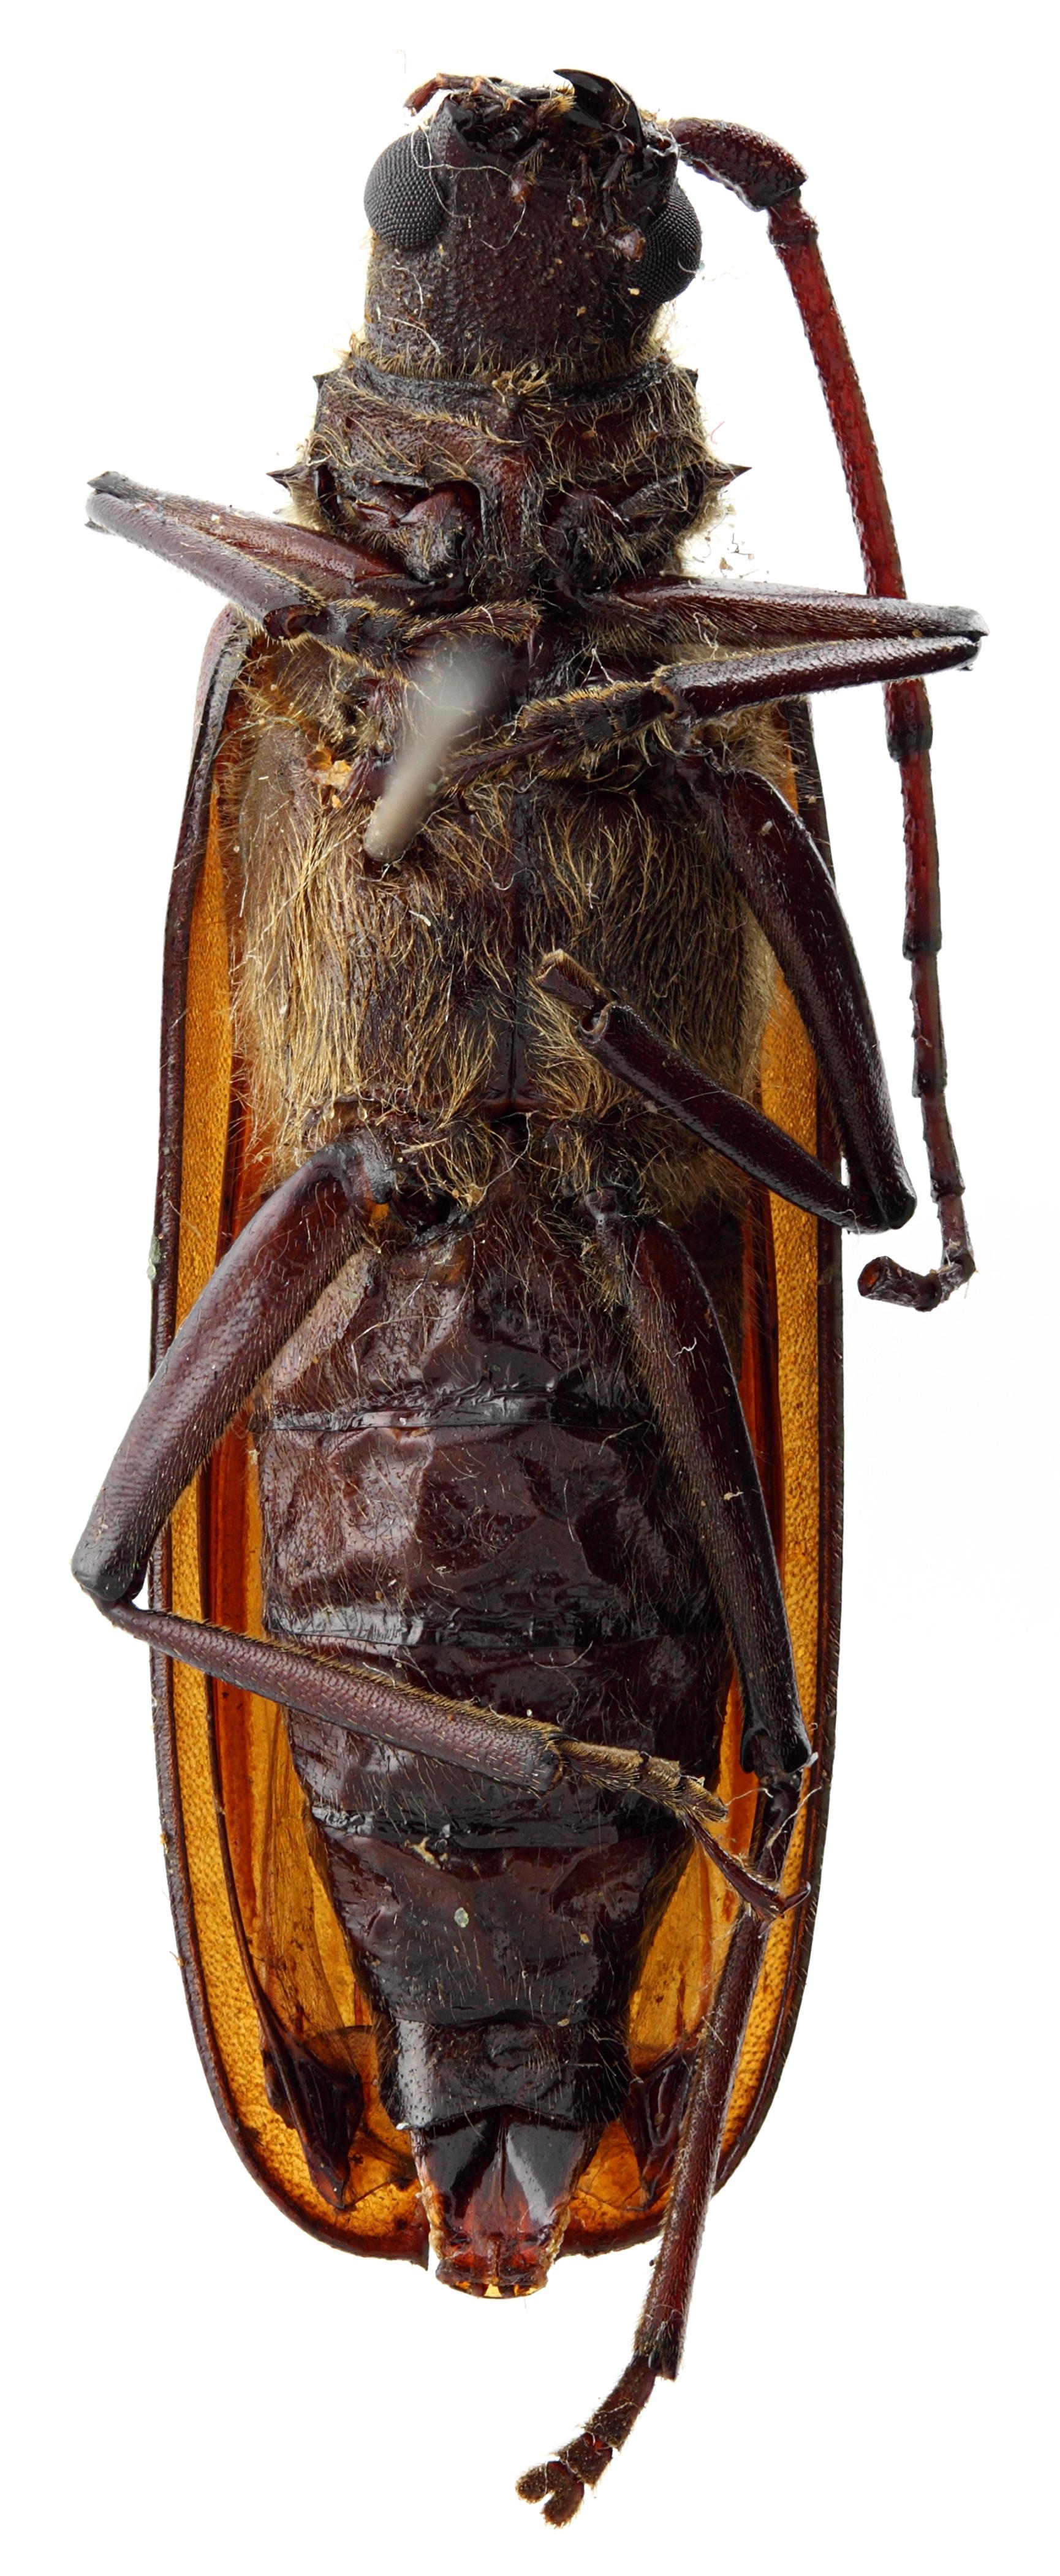 Spinimegopis formosana tamdaoana 03 SP Paratype F 034 BRUS 201405.jpg